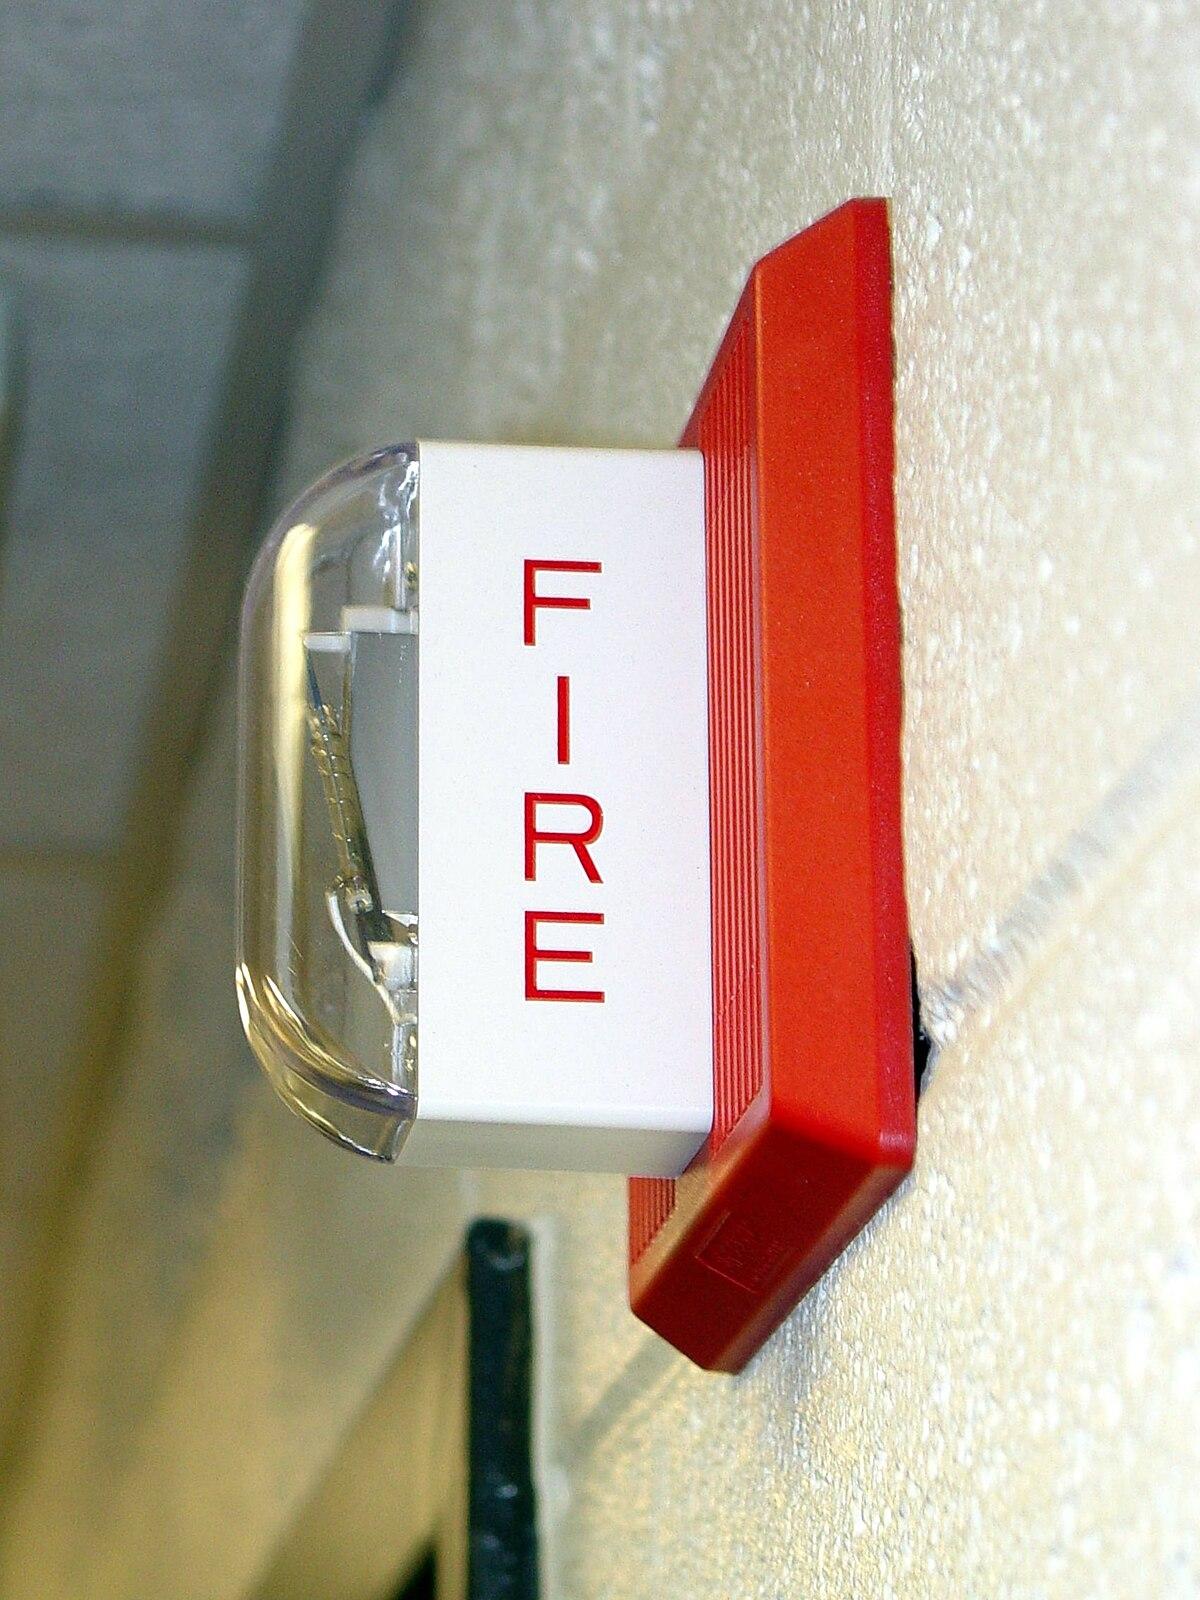 Alarm System Wiring Diagram Fire Alarm Wiring Diagram Wiring Diagrams